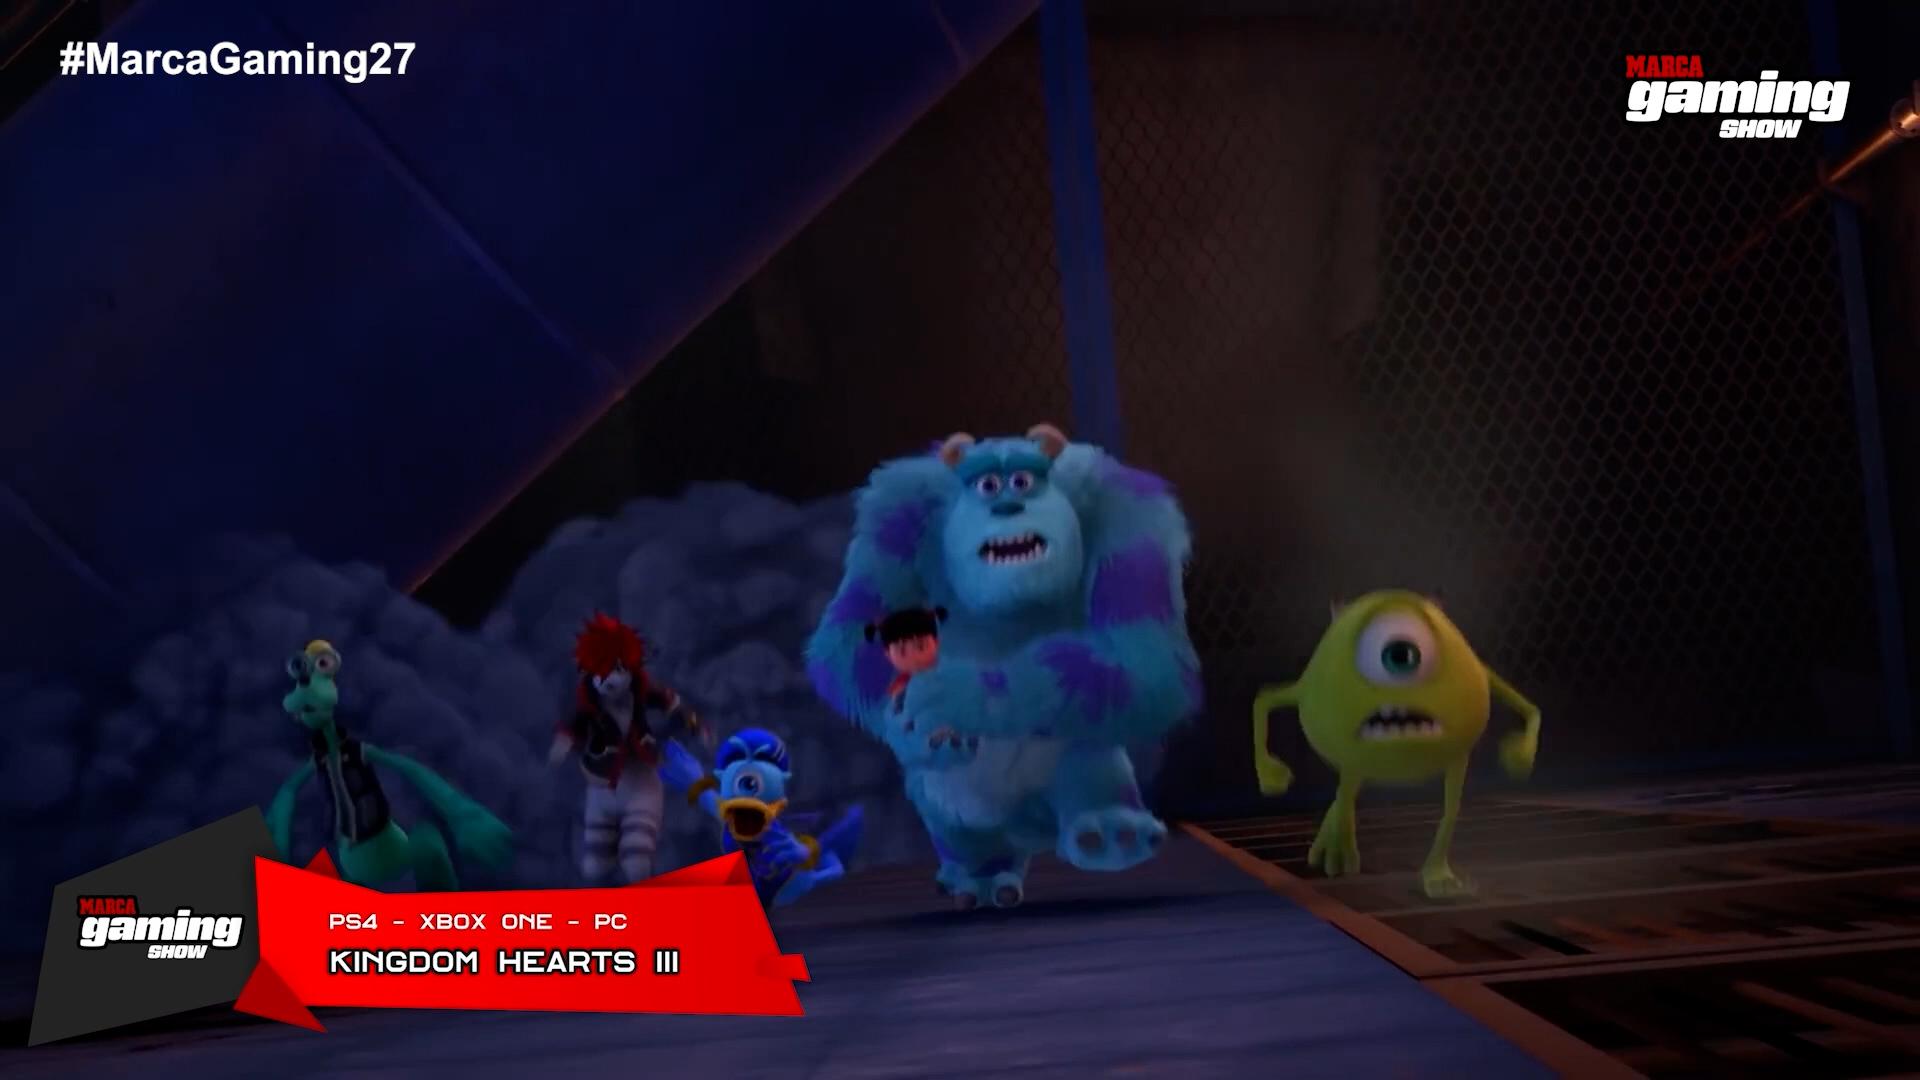 Kingdom Hearts III (PC)